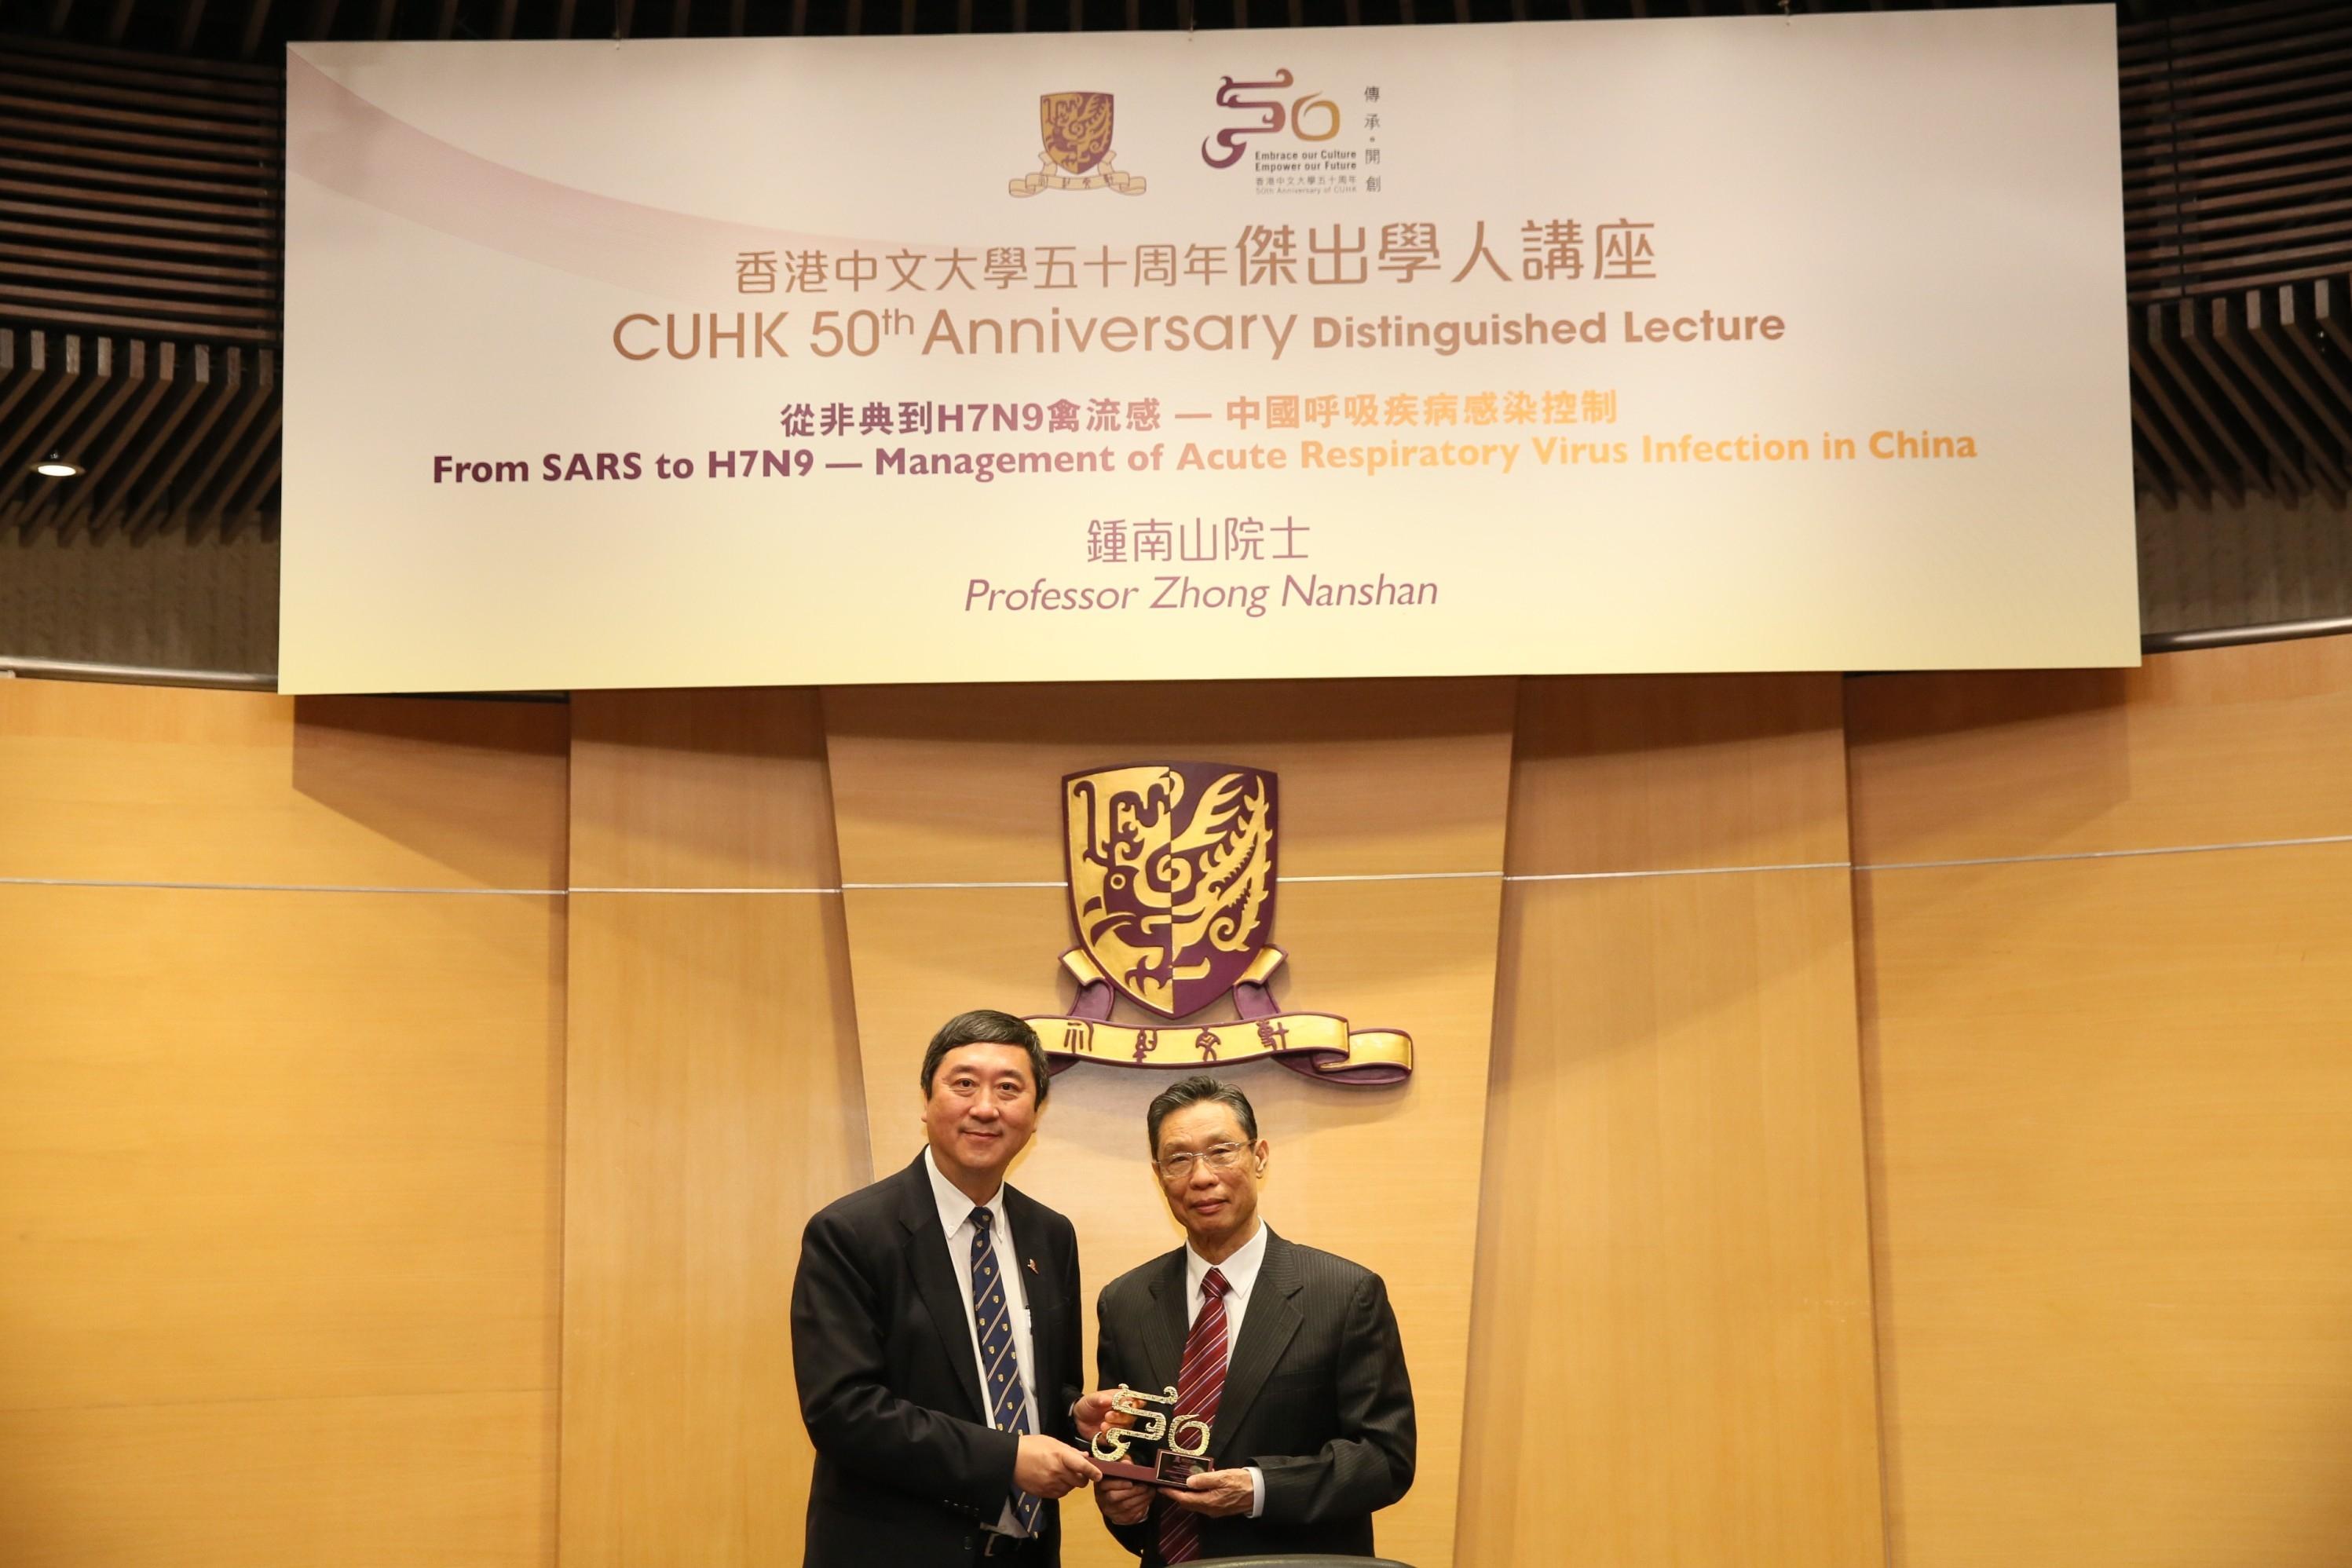 Prof. Joseph Sung, Vice-Chancellor of CUHK (left) presents a CUHK 50th anniversary souvenir to Prof. Zhong Nanshan.